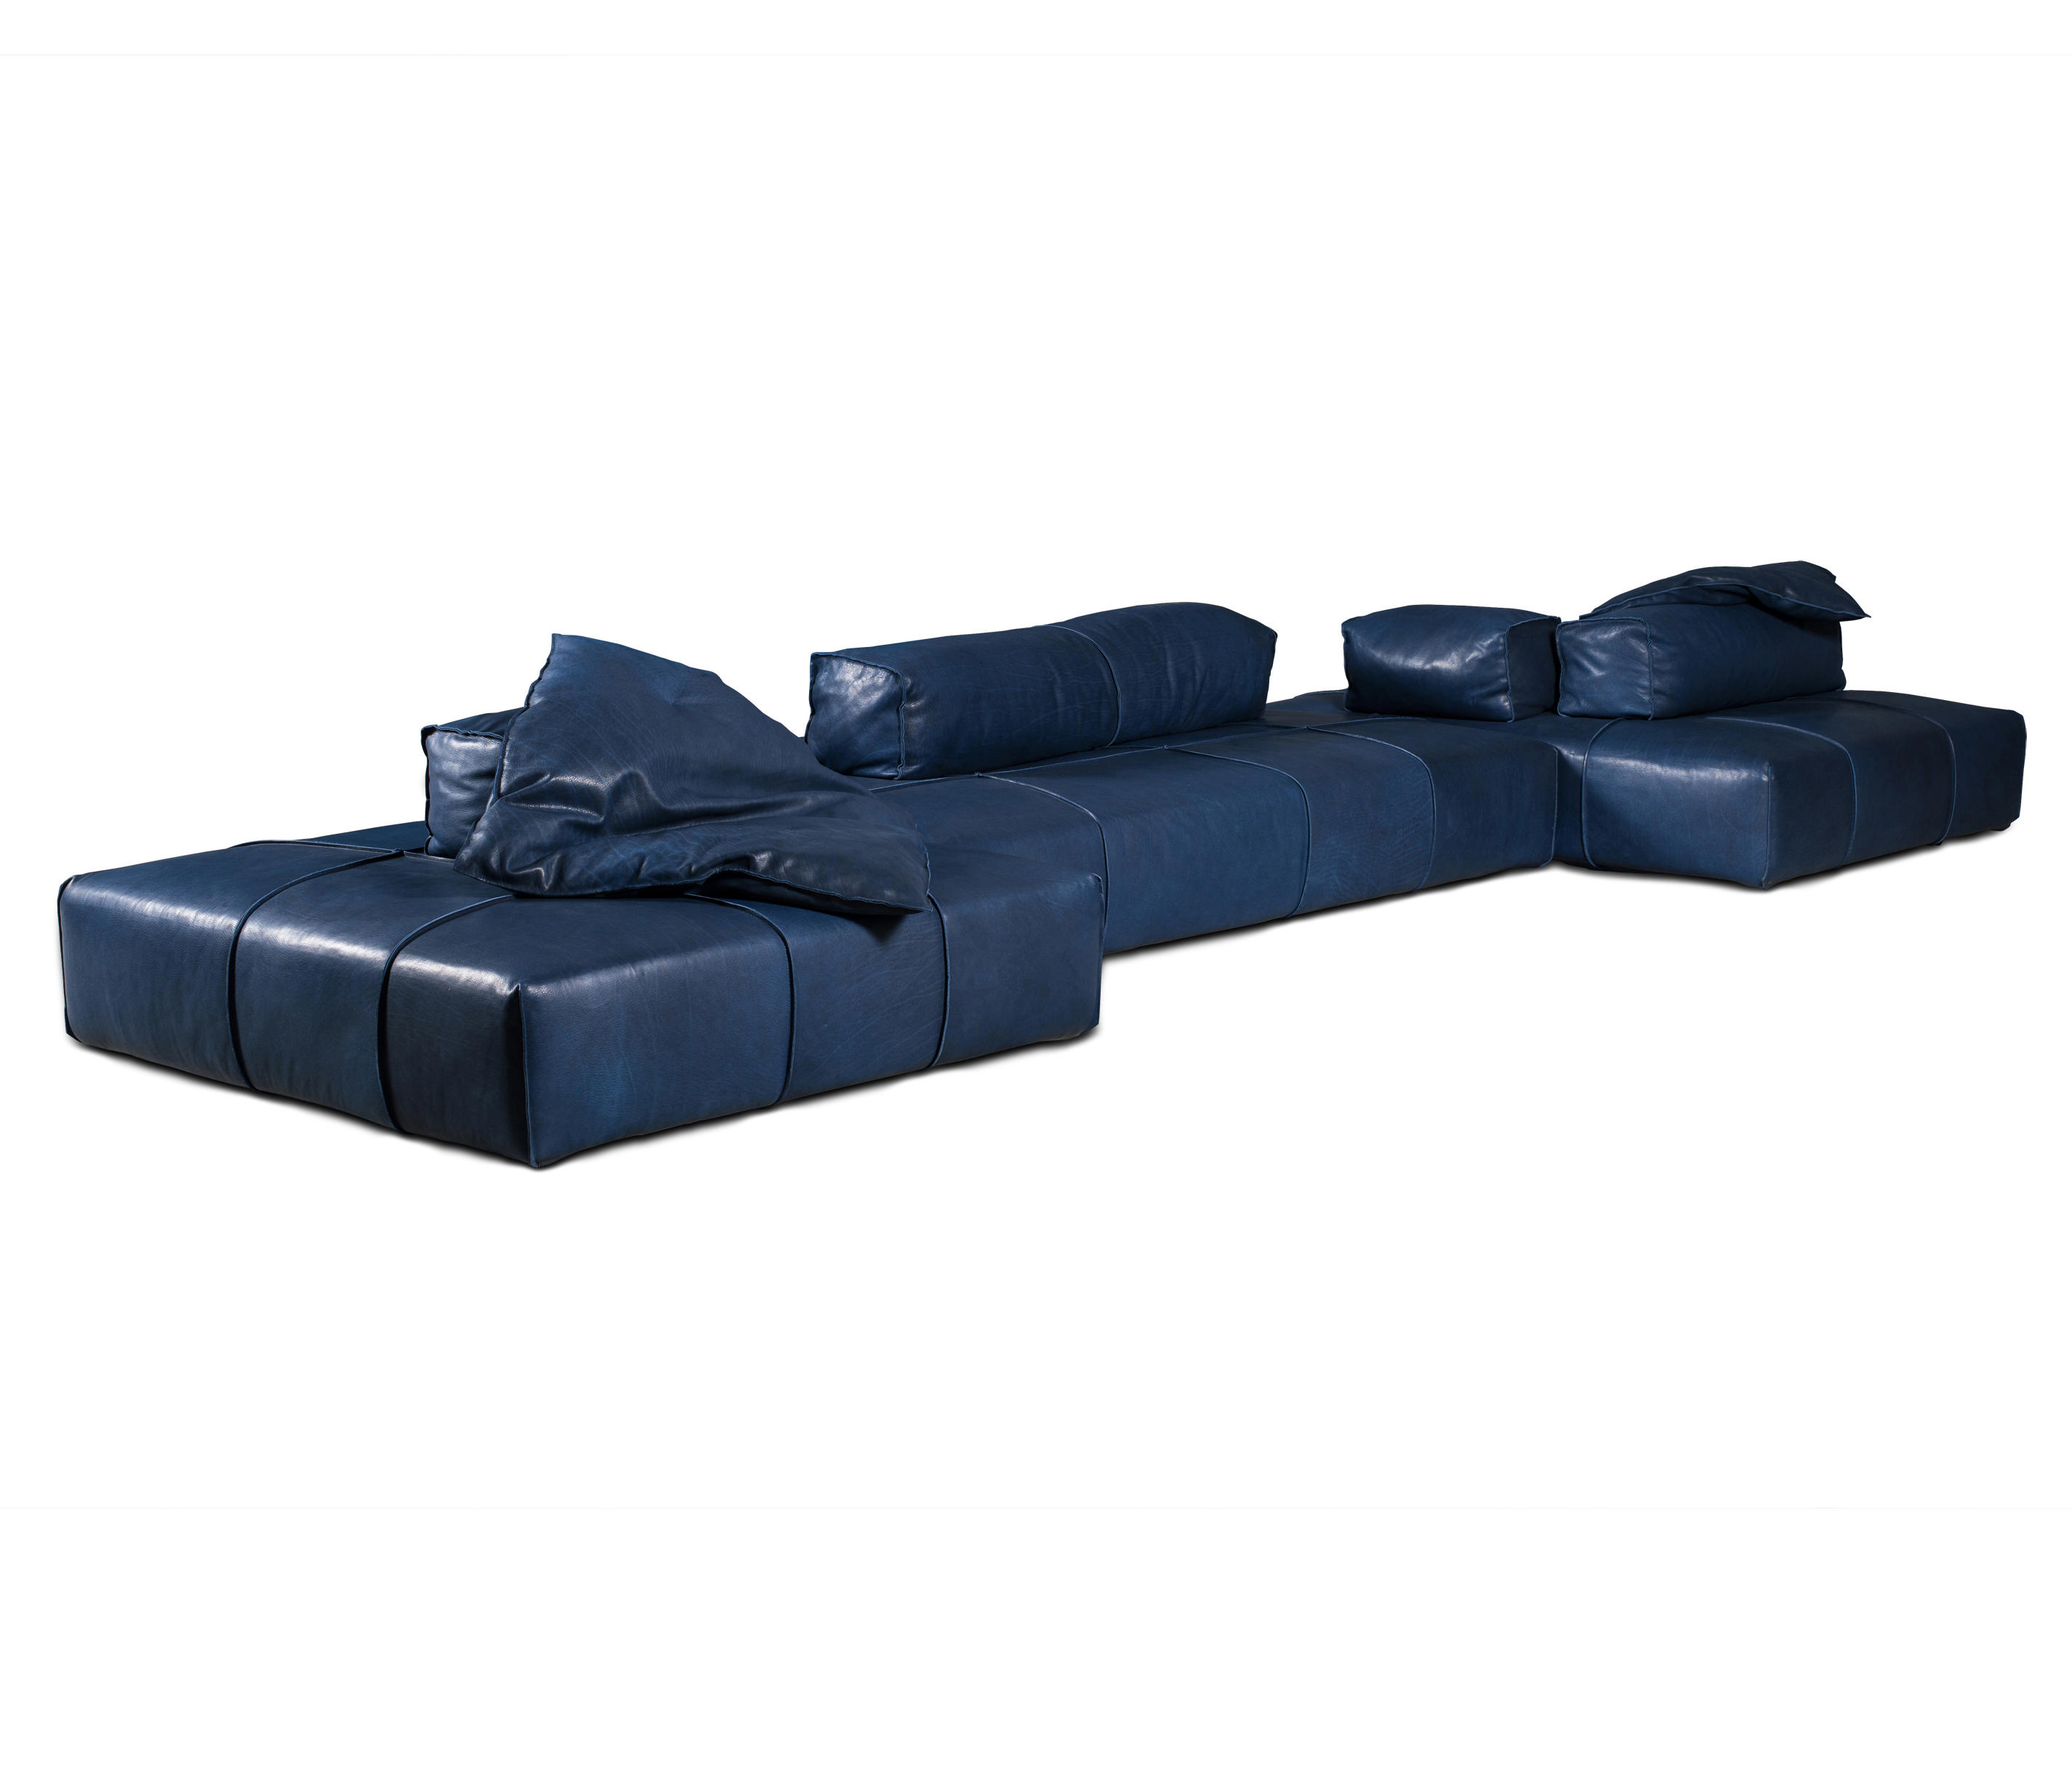 Panama Bold Outdoor Modular Sofa By Baxter Sofas